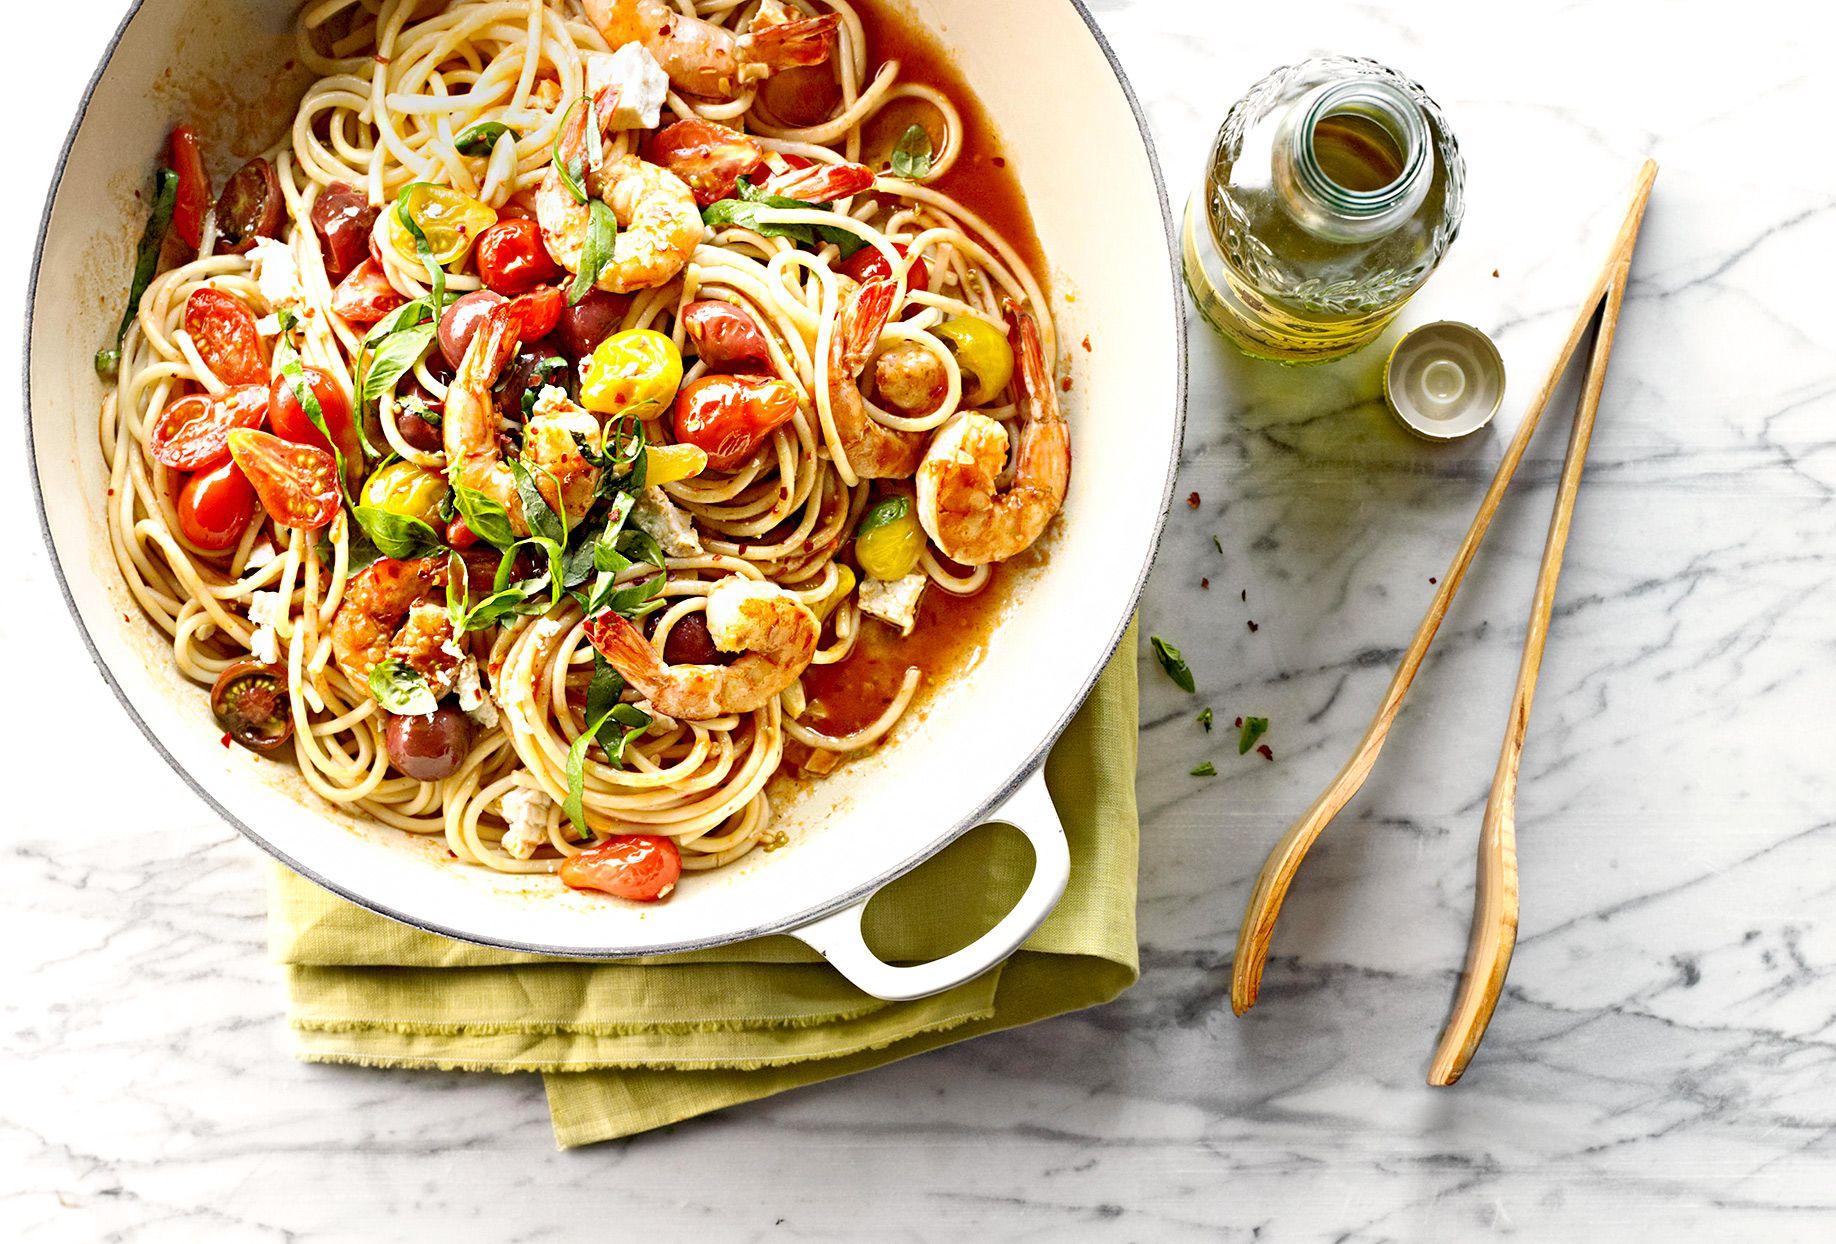 ca501d1e23a0a09776c36aad8c7d719f - Better Homes And Gardens Pasta Recipes